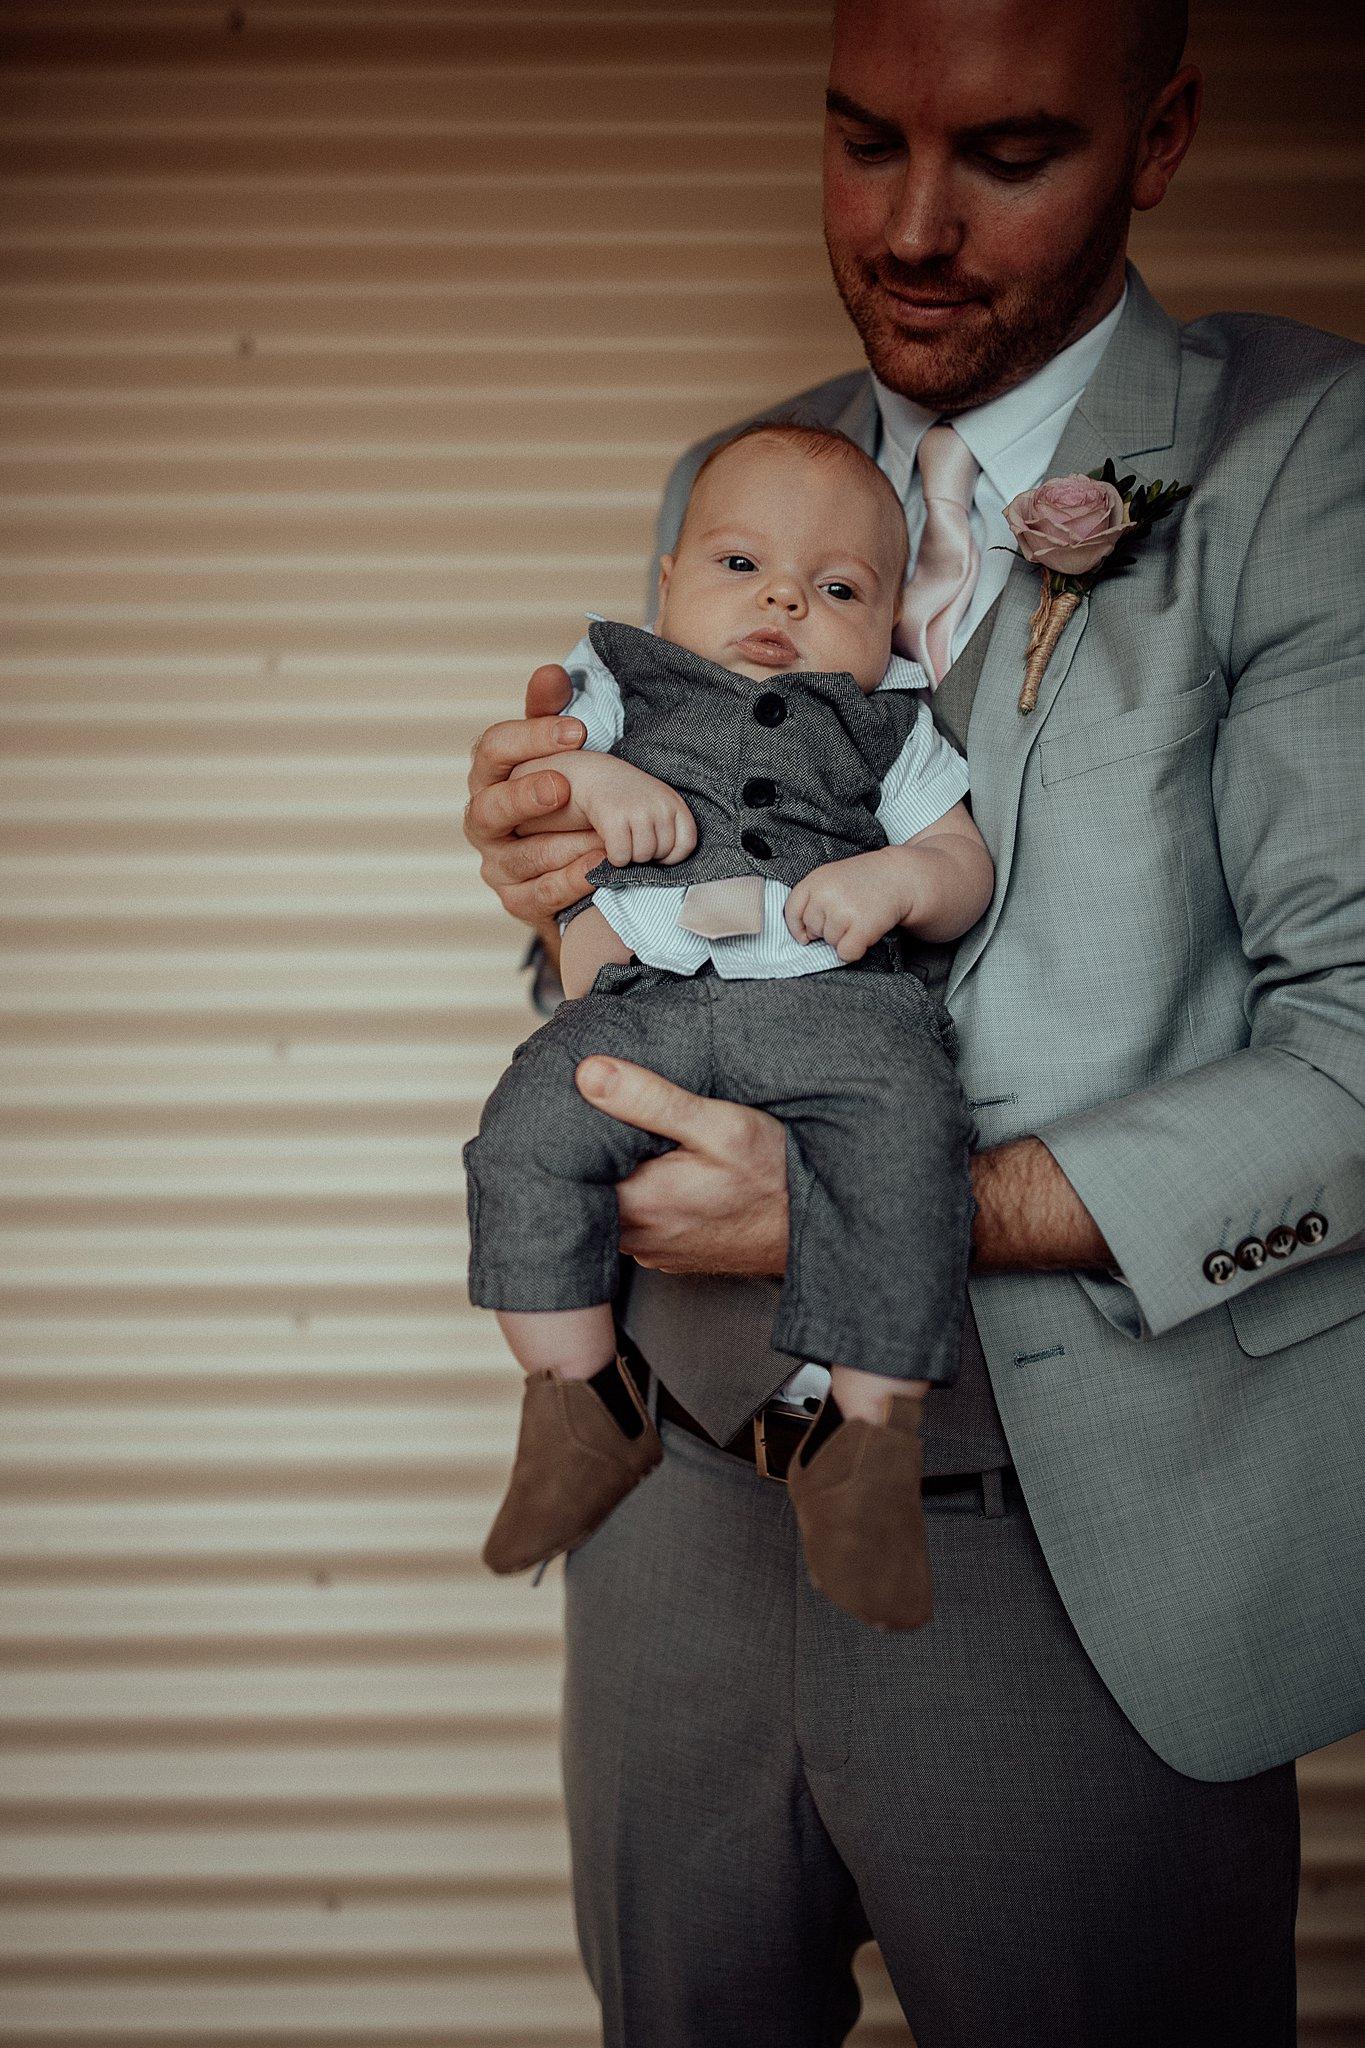 mickalathomas_puremacphotography_weddingphotographer_couplephotographer_Sheppartonphotographer_3406.jpg